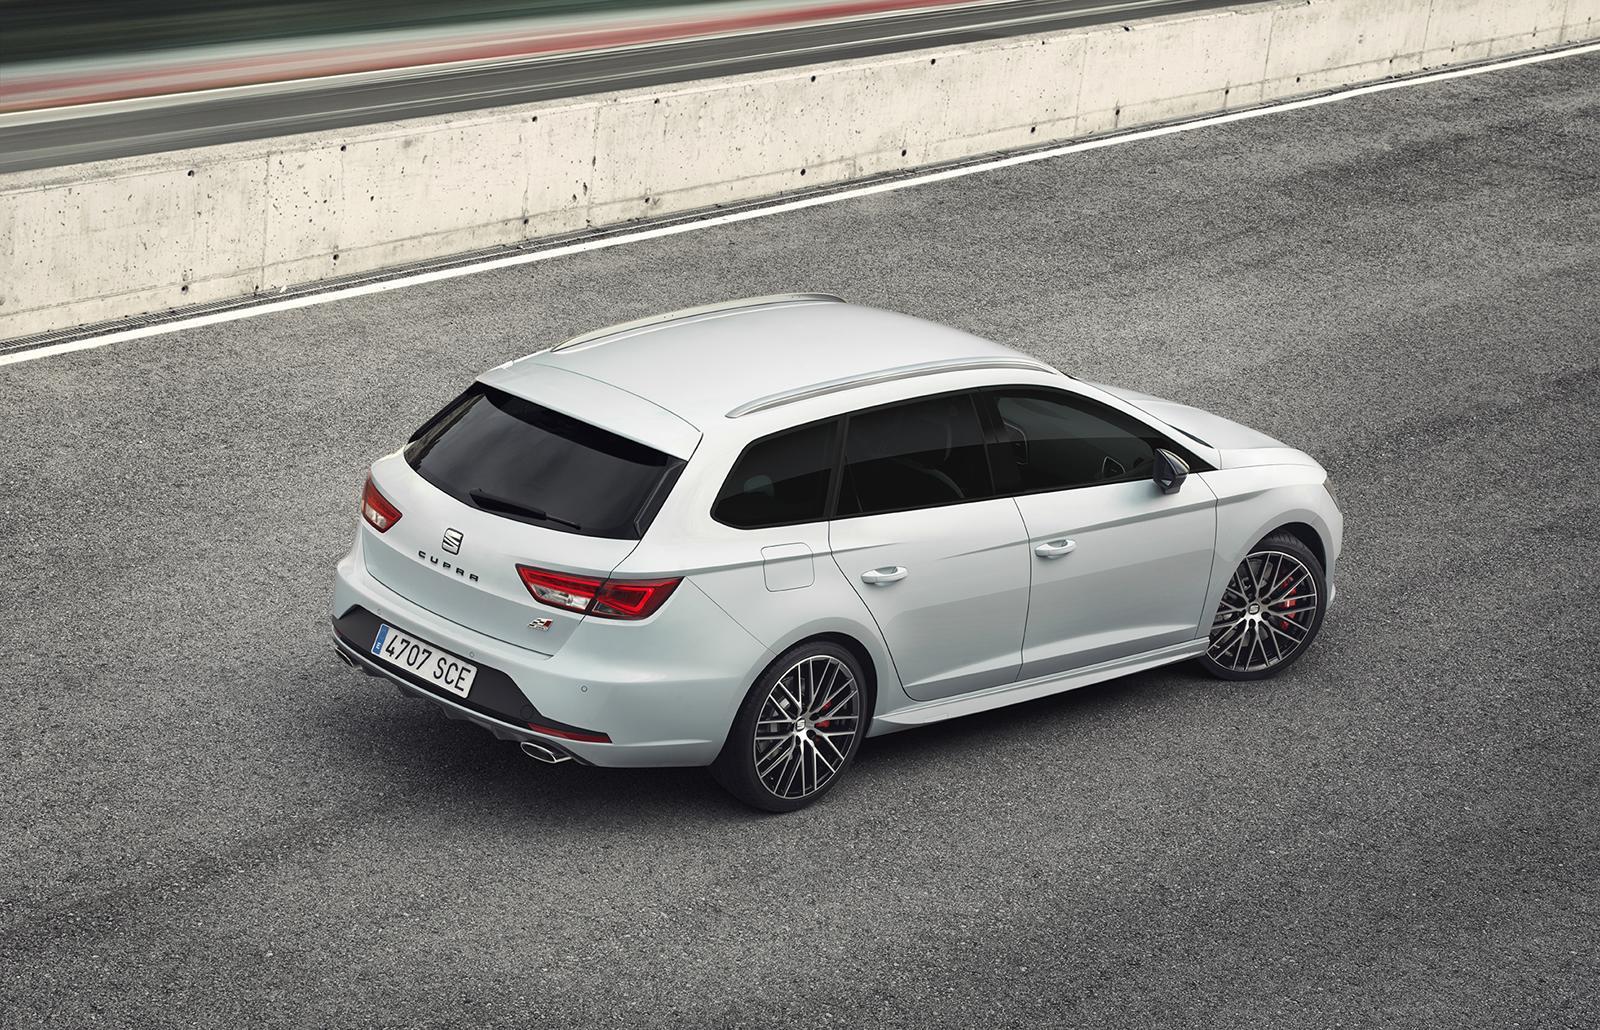 2015 seat leon st cupra revealed 280 hp hot estate. Black Bedroom Furniture Sets. Home Design Ideas